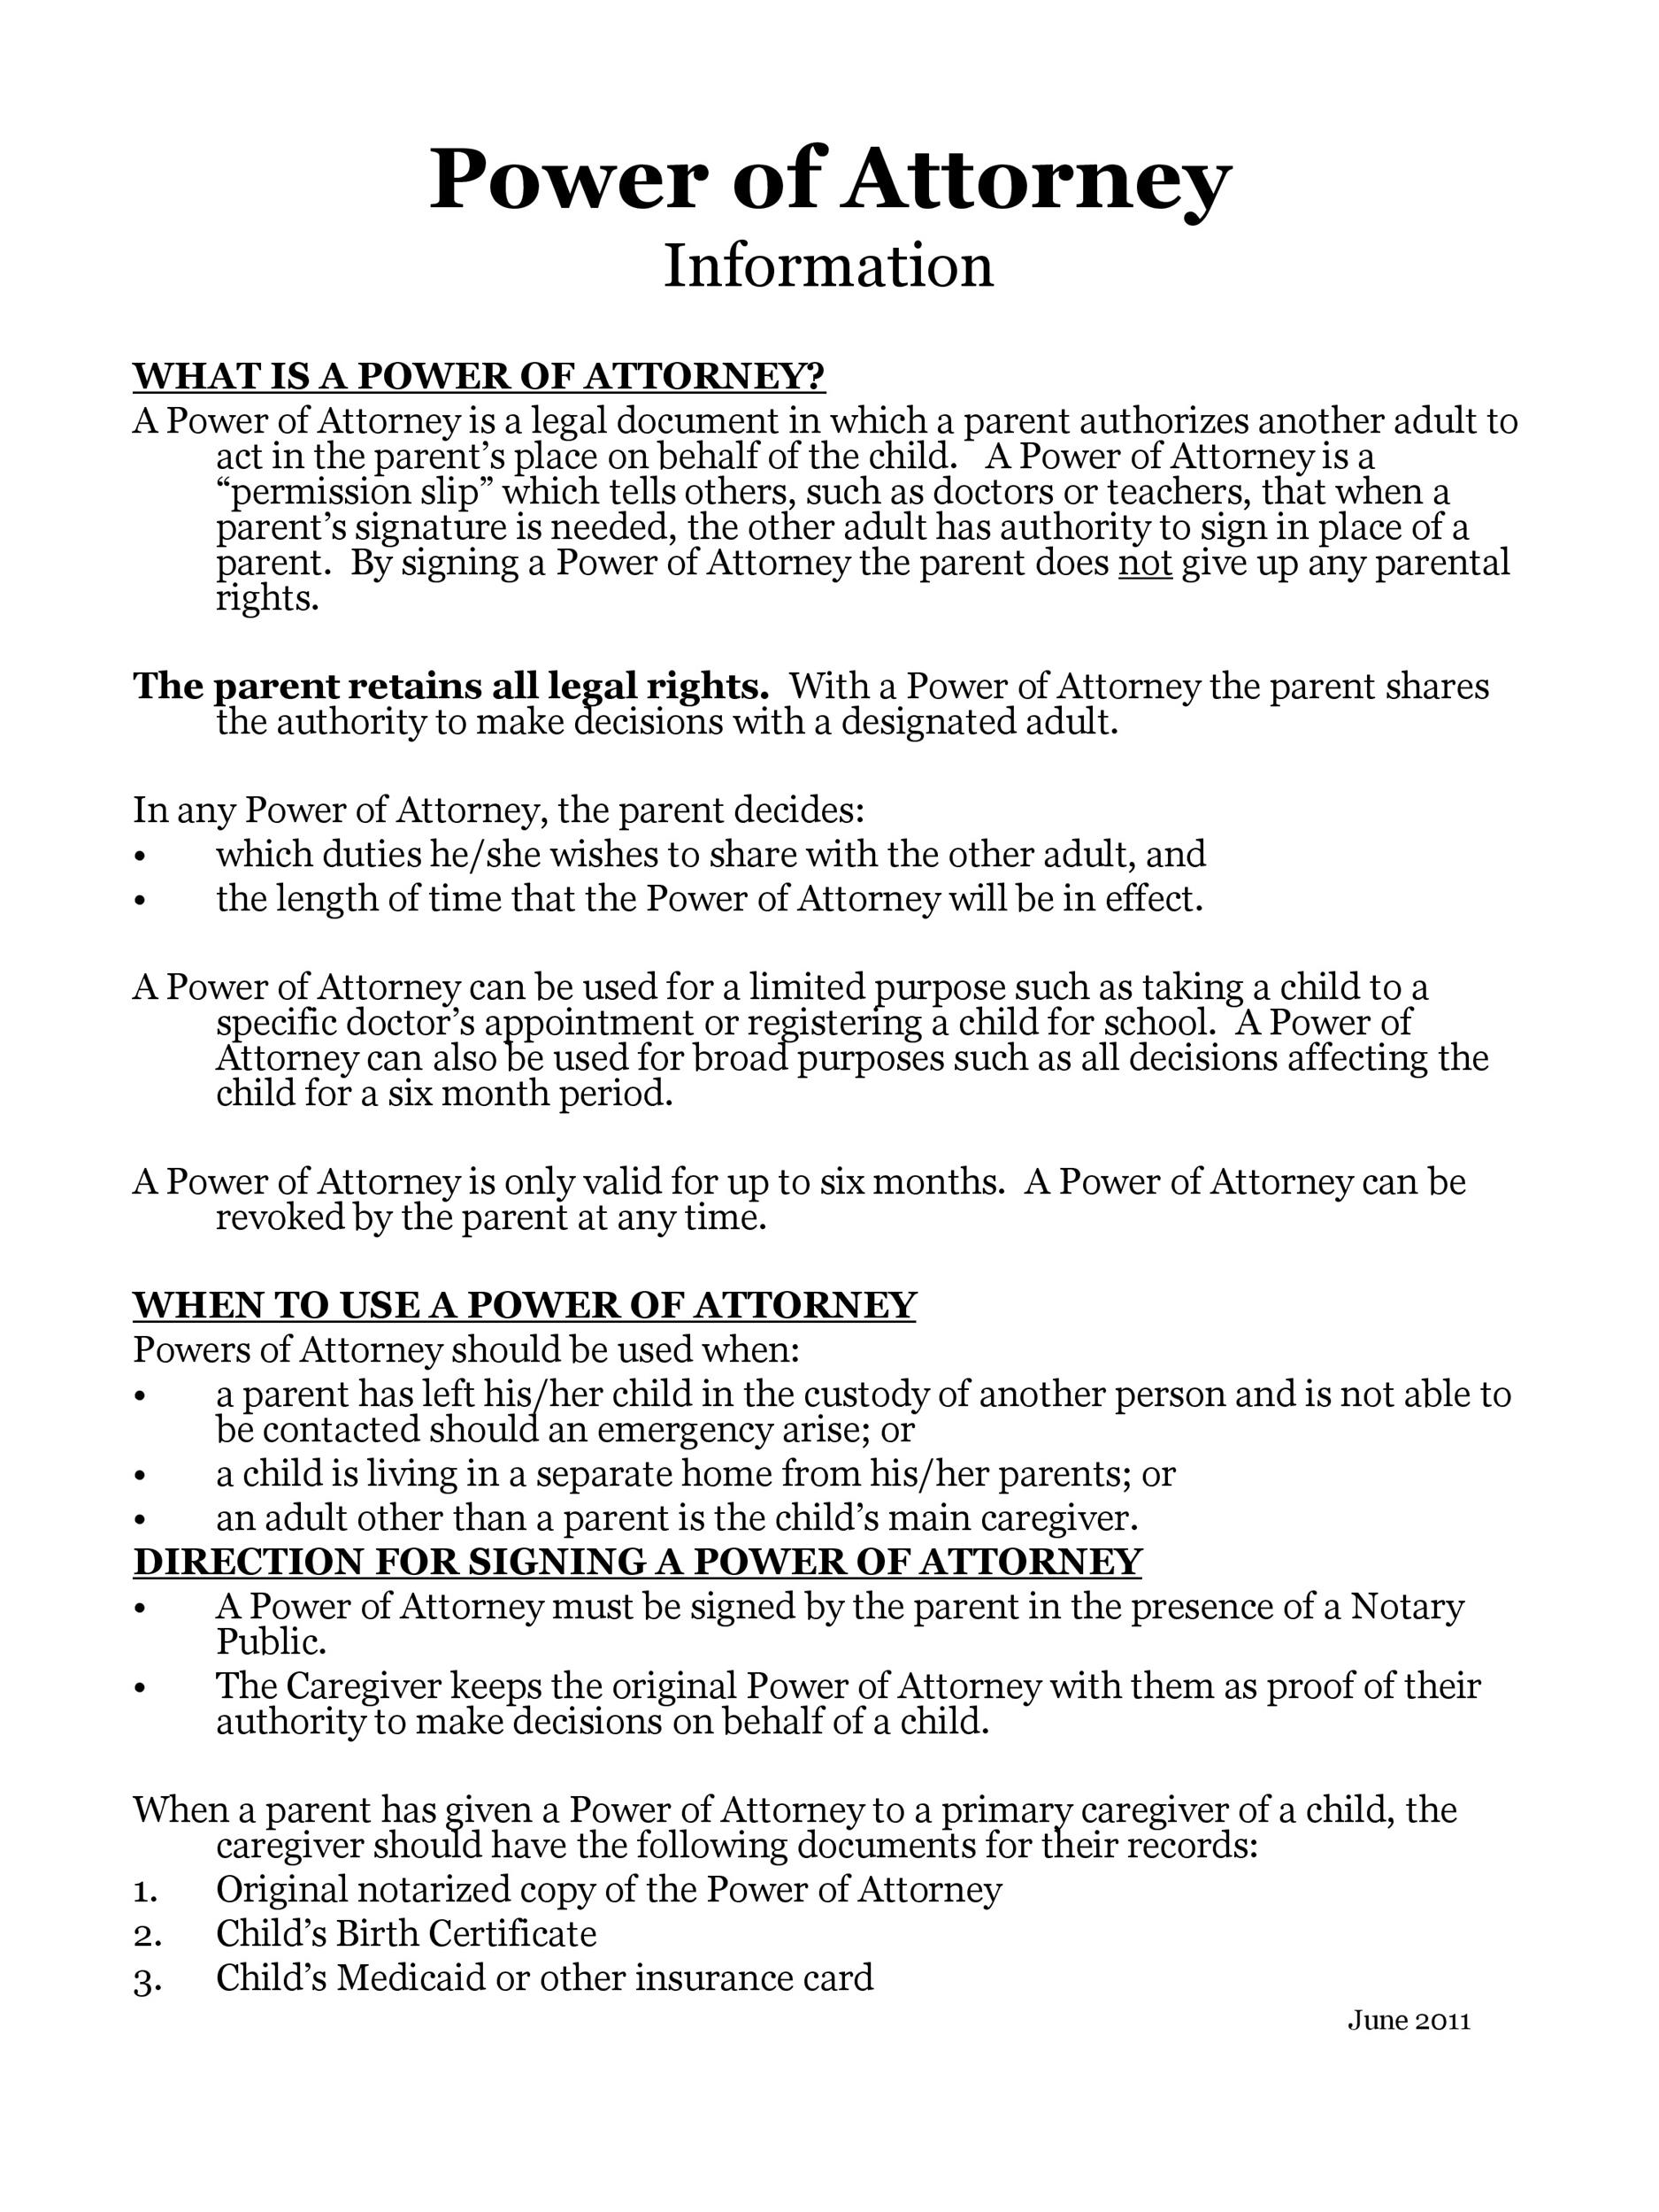 Free power of attorney 50